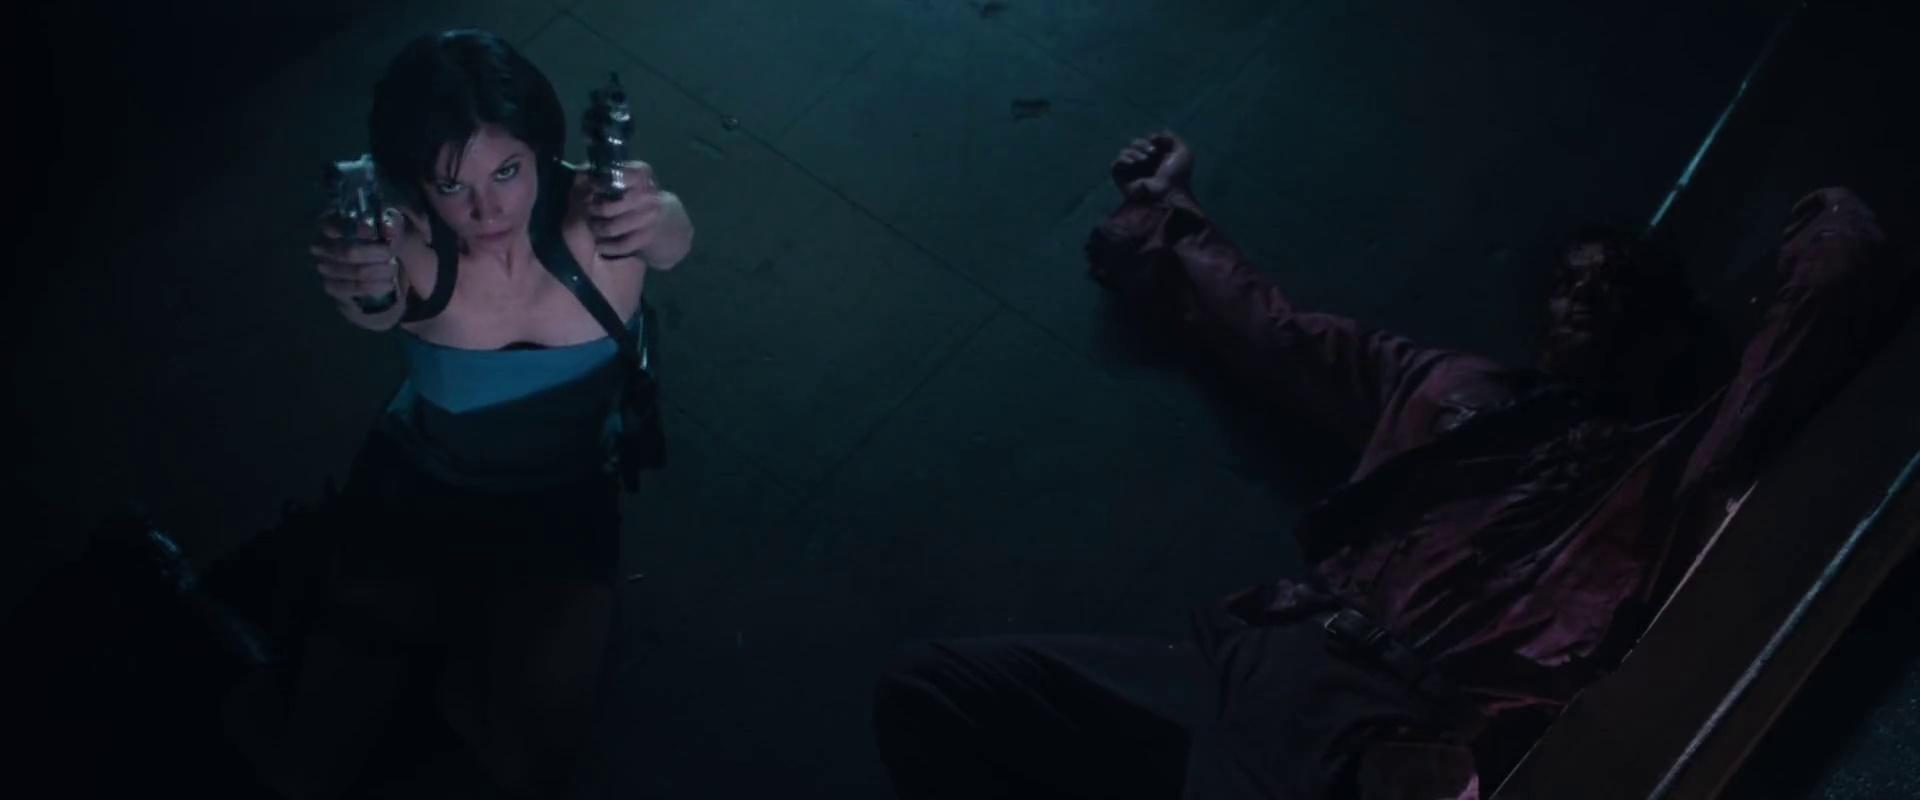 Galerie Resident Evil: Apocalypse 4